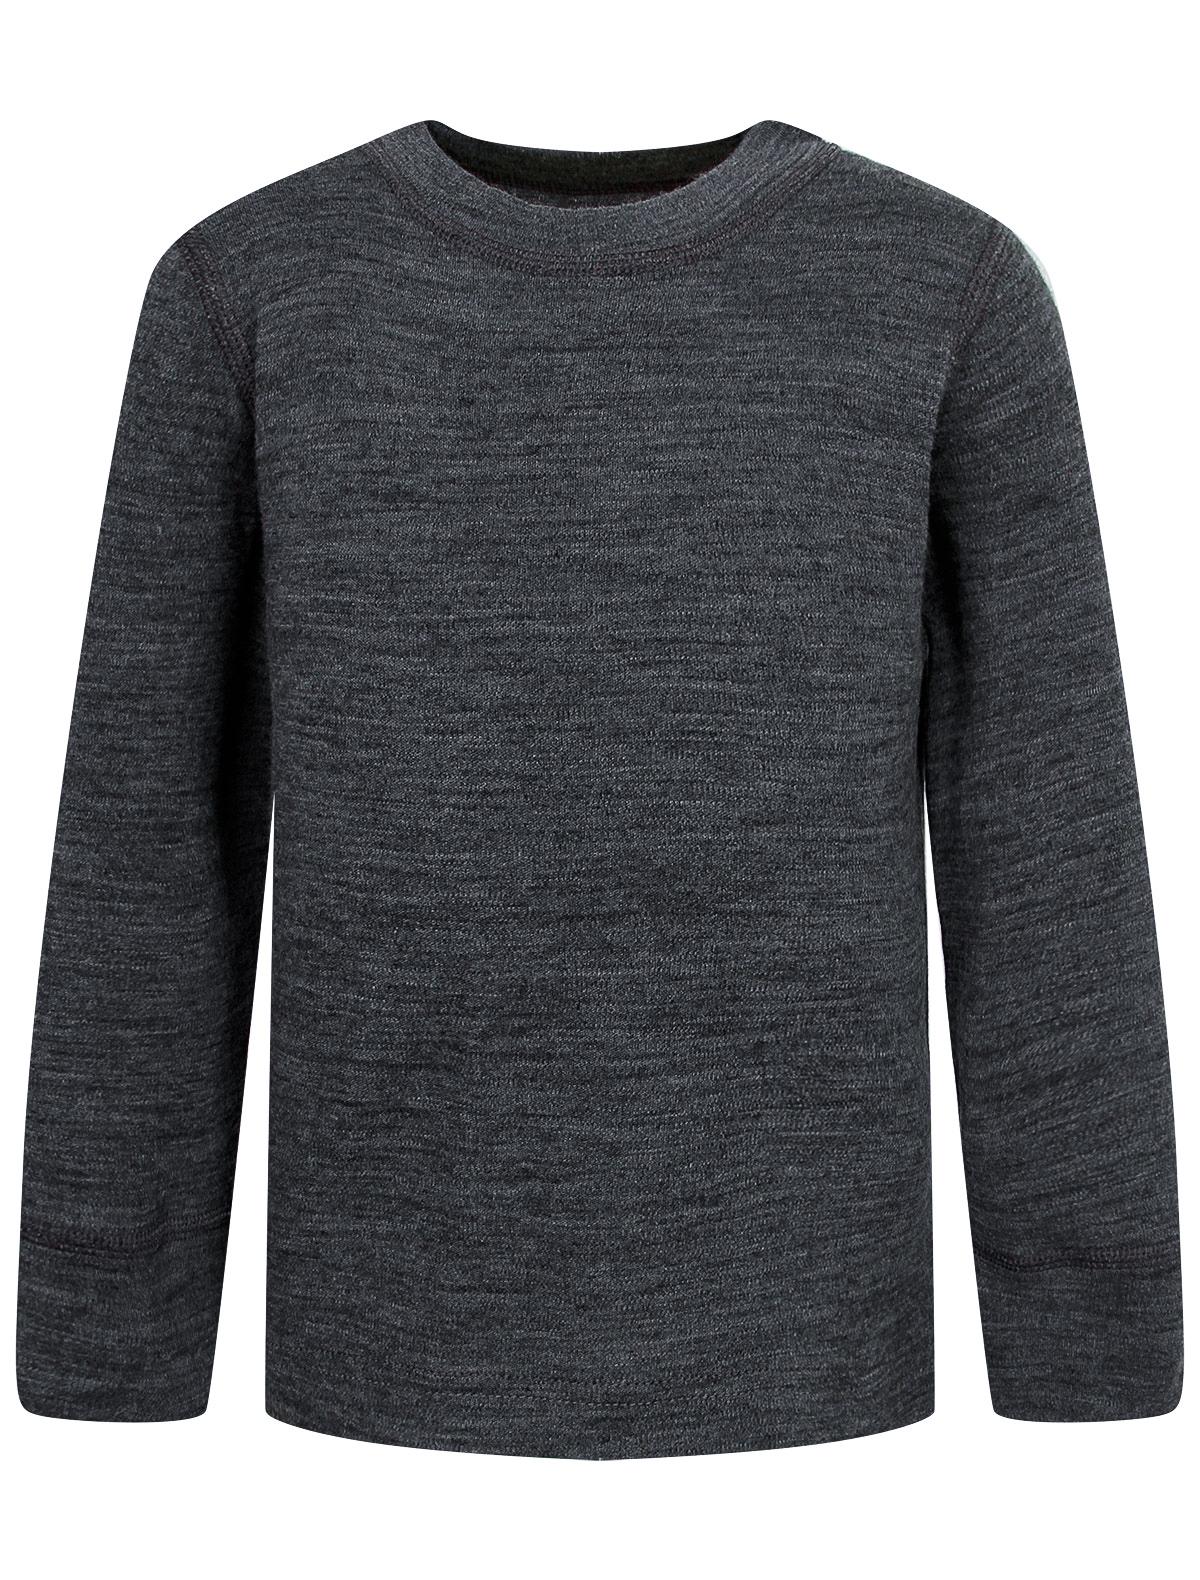 Купить 2249473, Термобелье Air wool, серый, 1724529080167